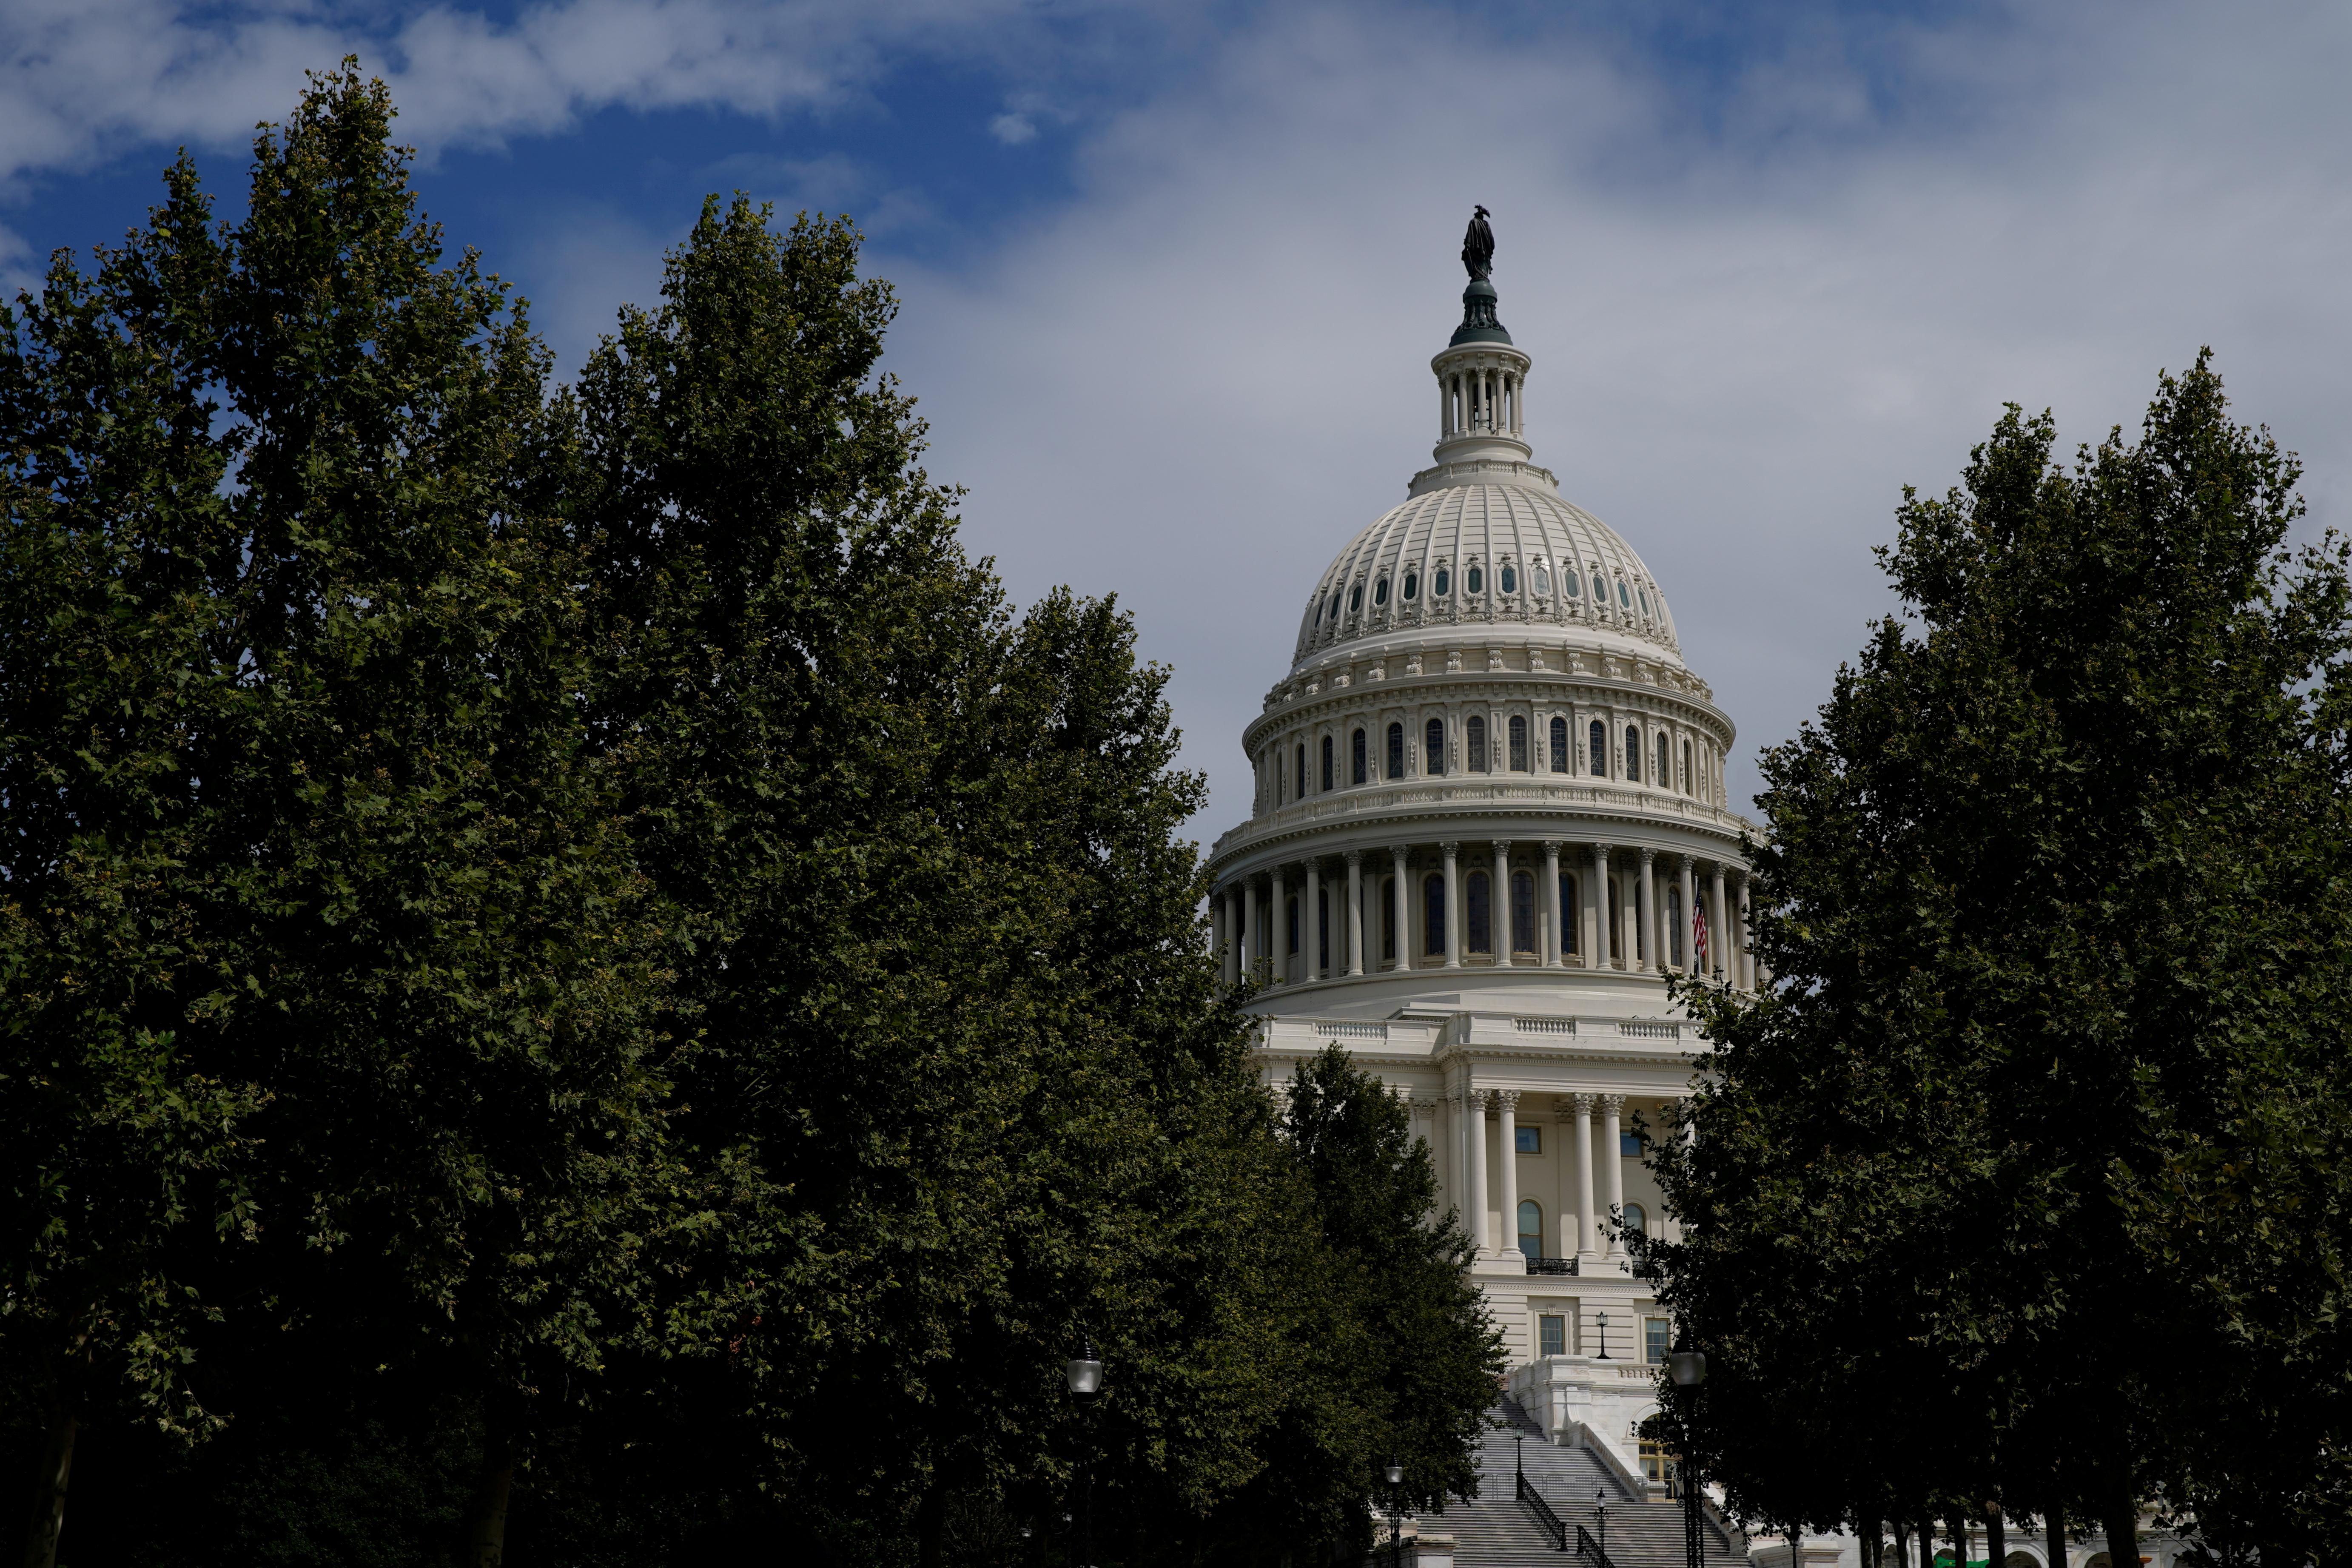 The U.S. Capitol Building is pictured in Washington, U.S., August 20, 2021. REUTERS/Elizabeth Frantz